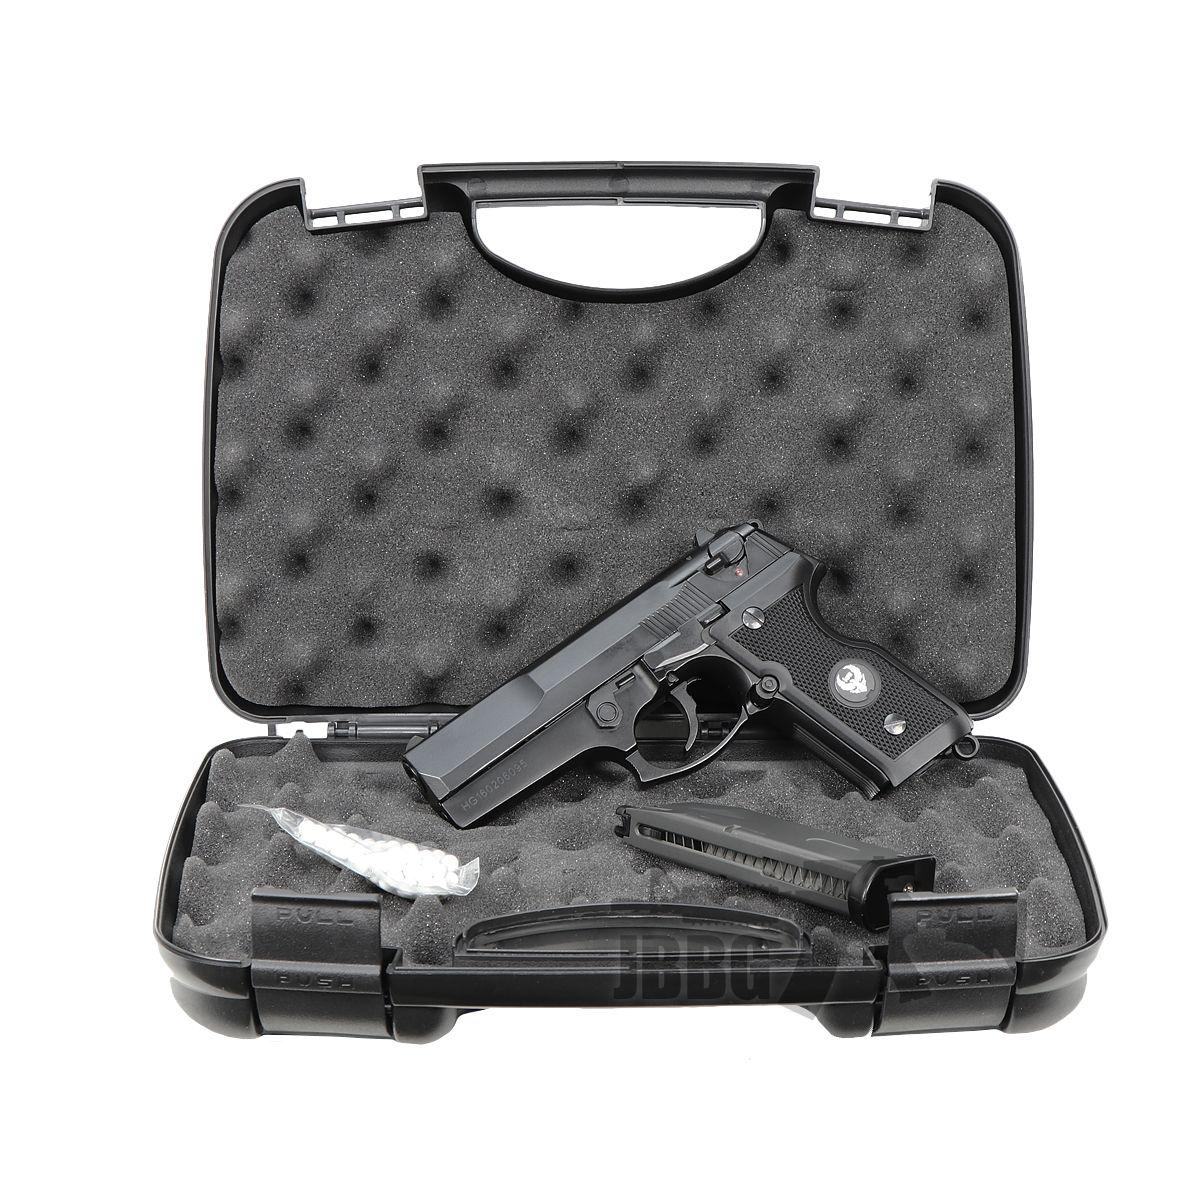 hg160 semi auto airsoft pistol d1